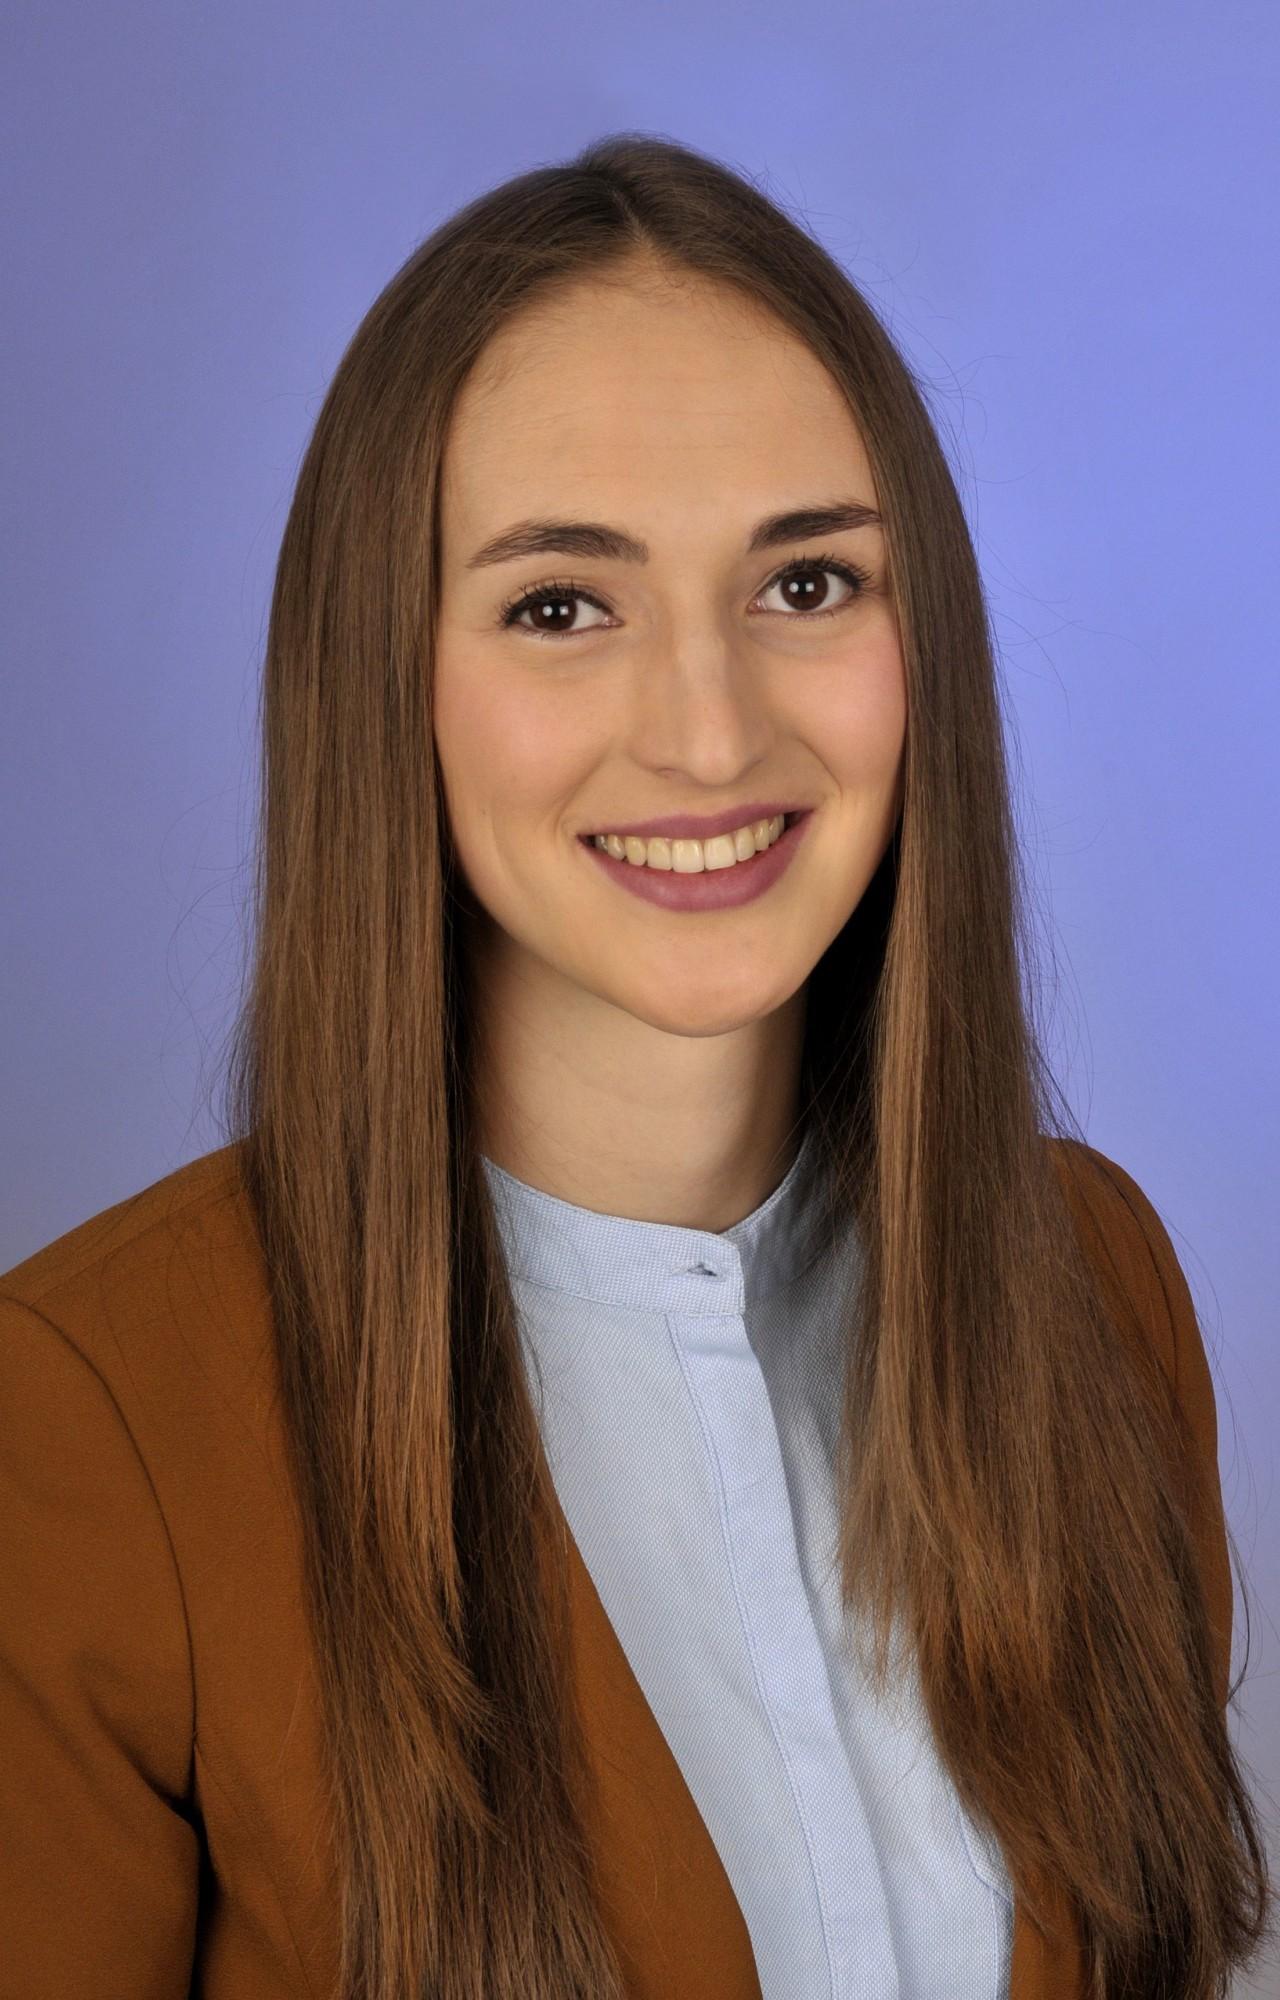 Theresa Schneeberger